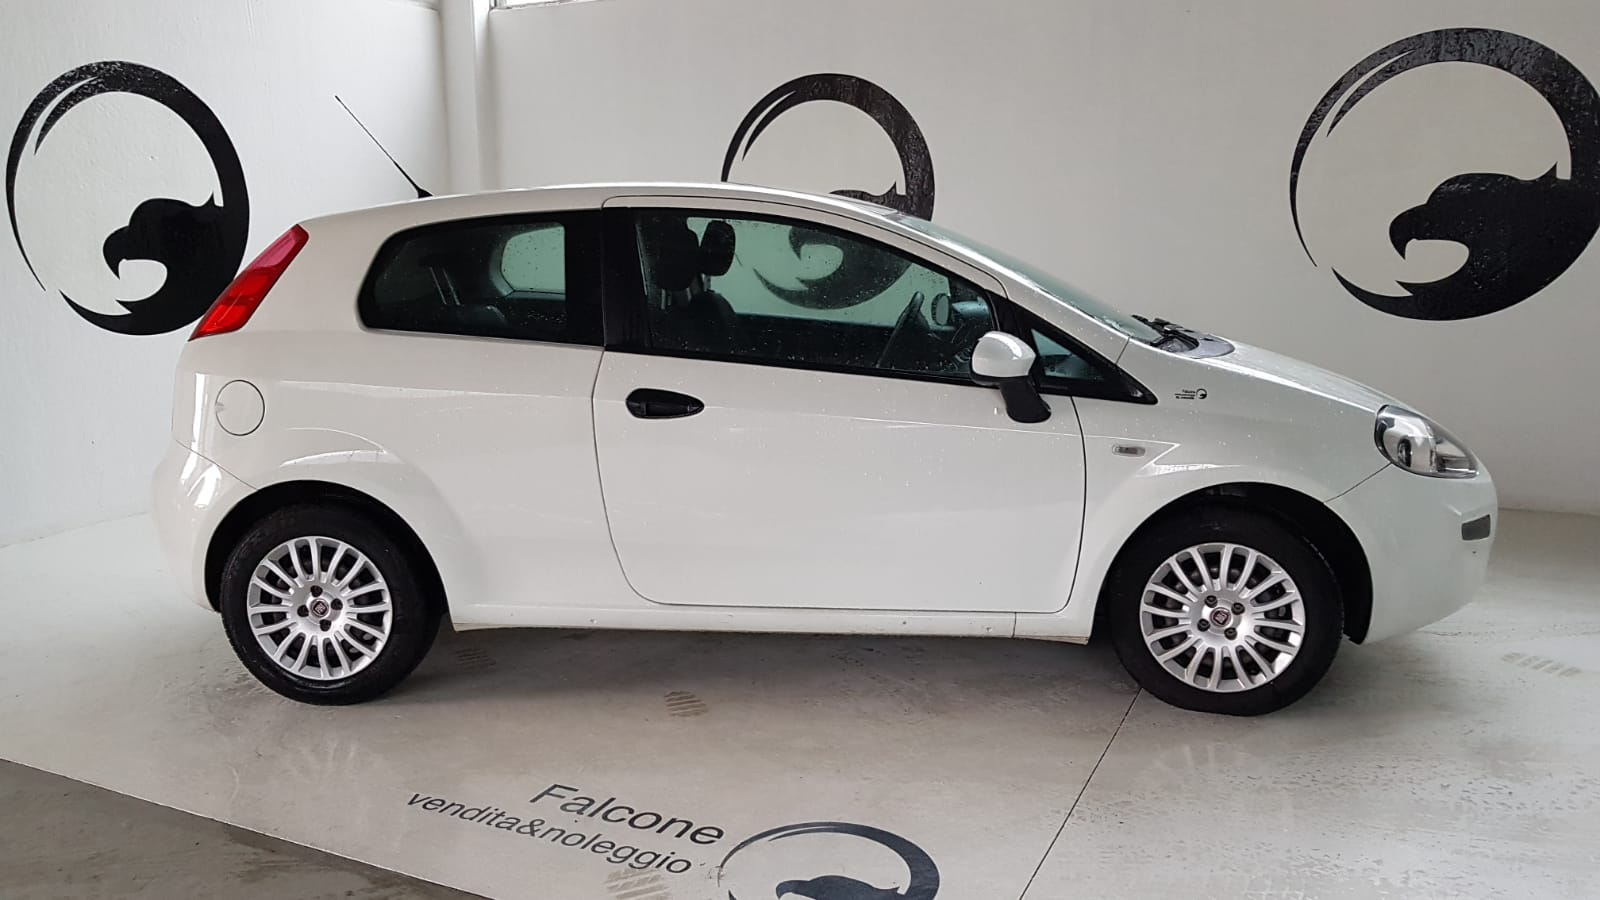 Fiat Punto 1.3 Mtj 3